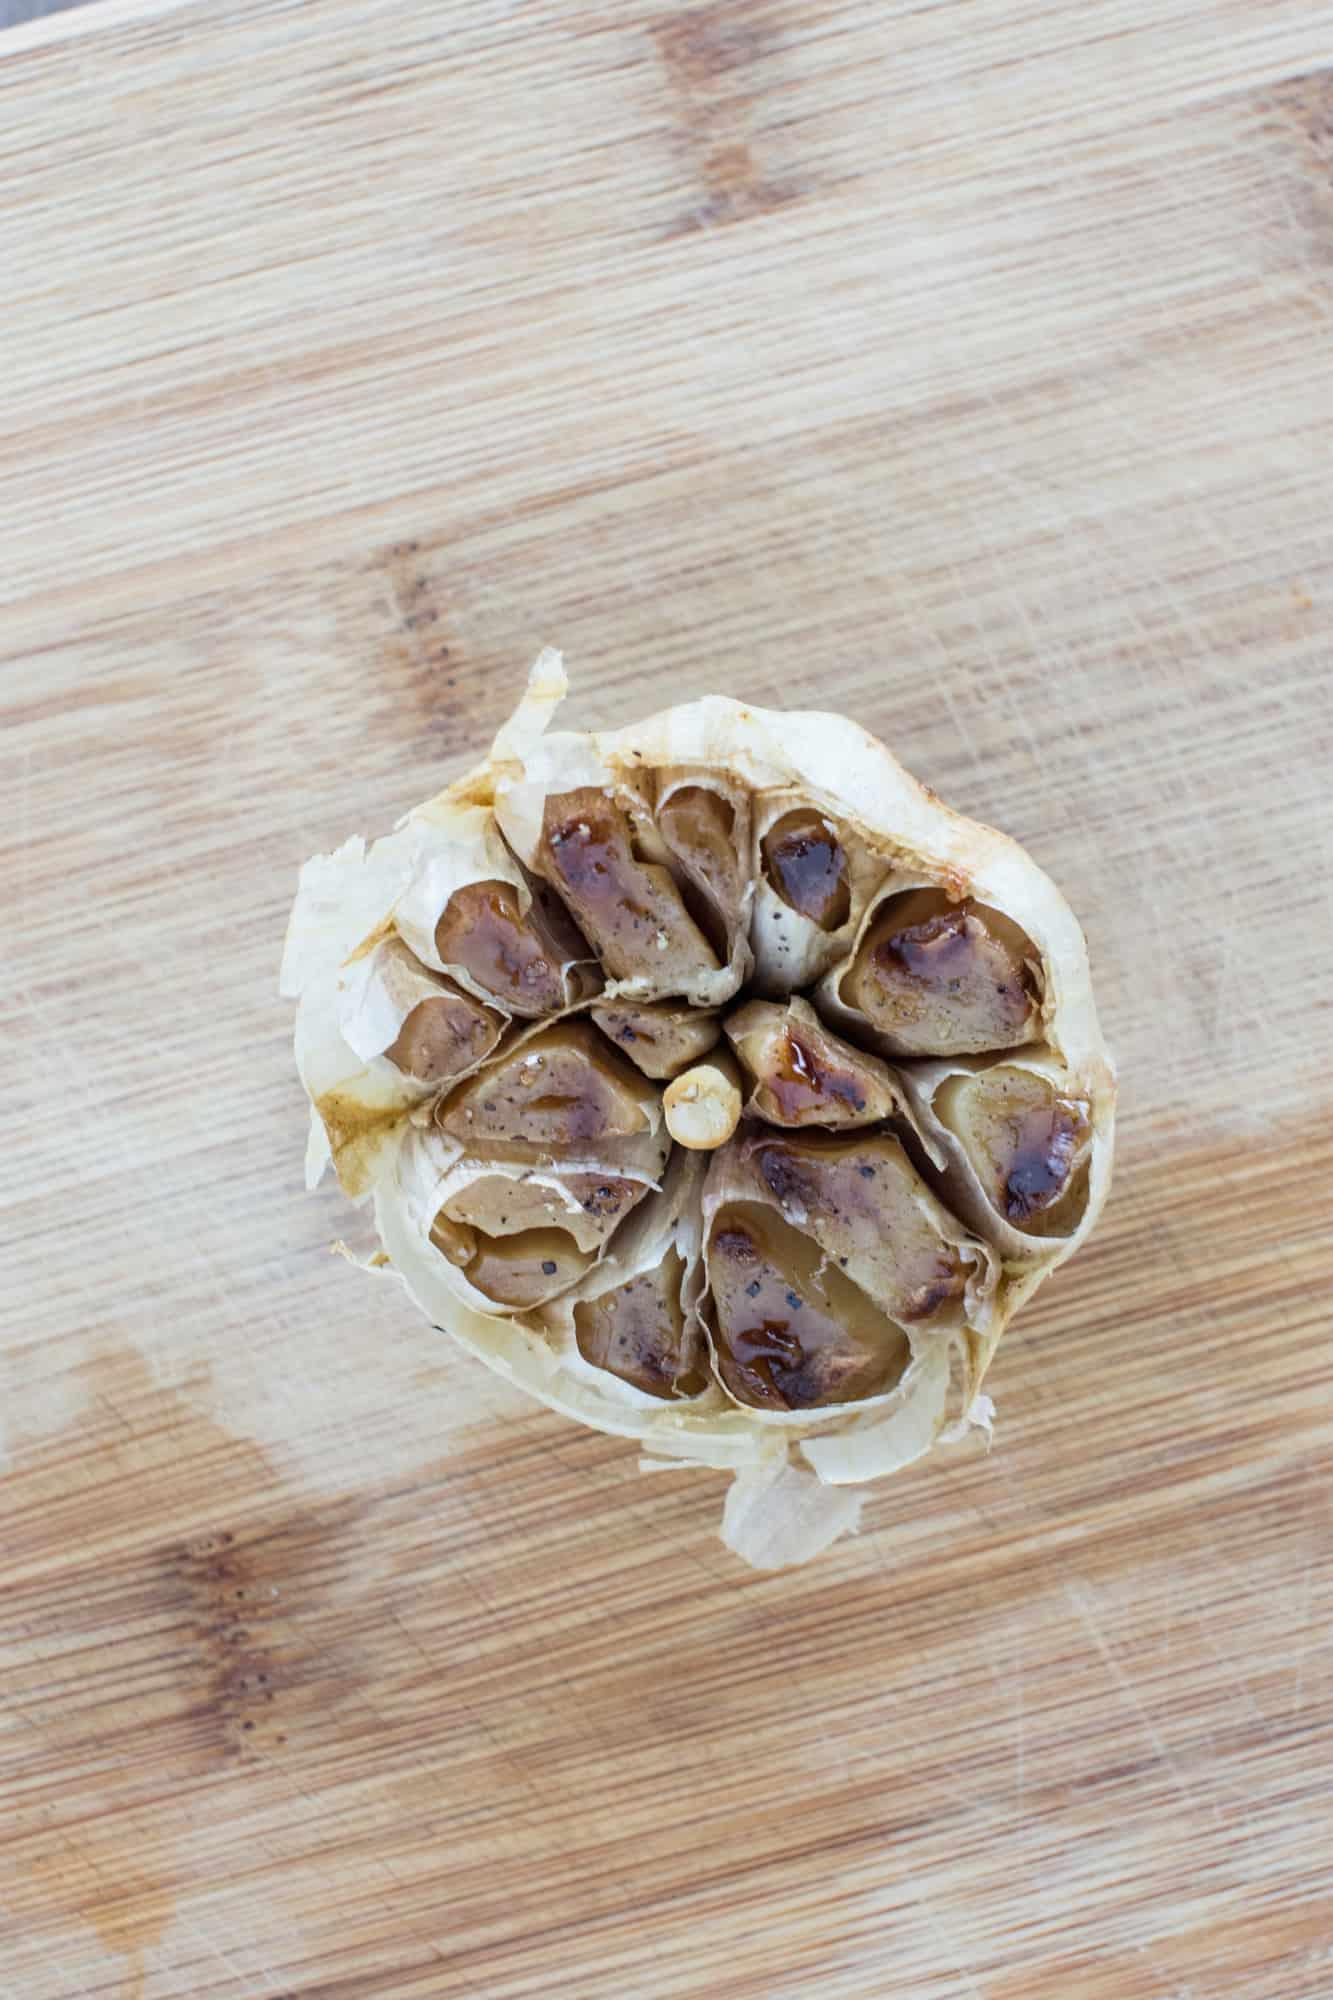 garlic bulb on wooden board after roasting